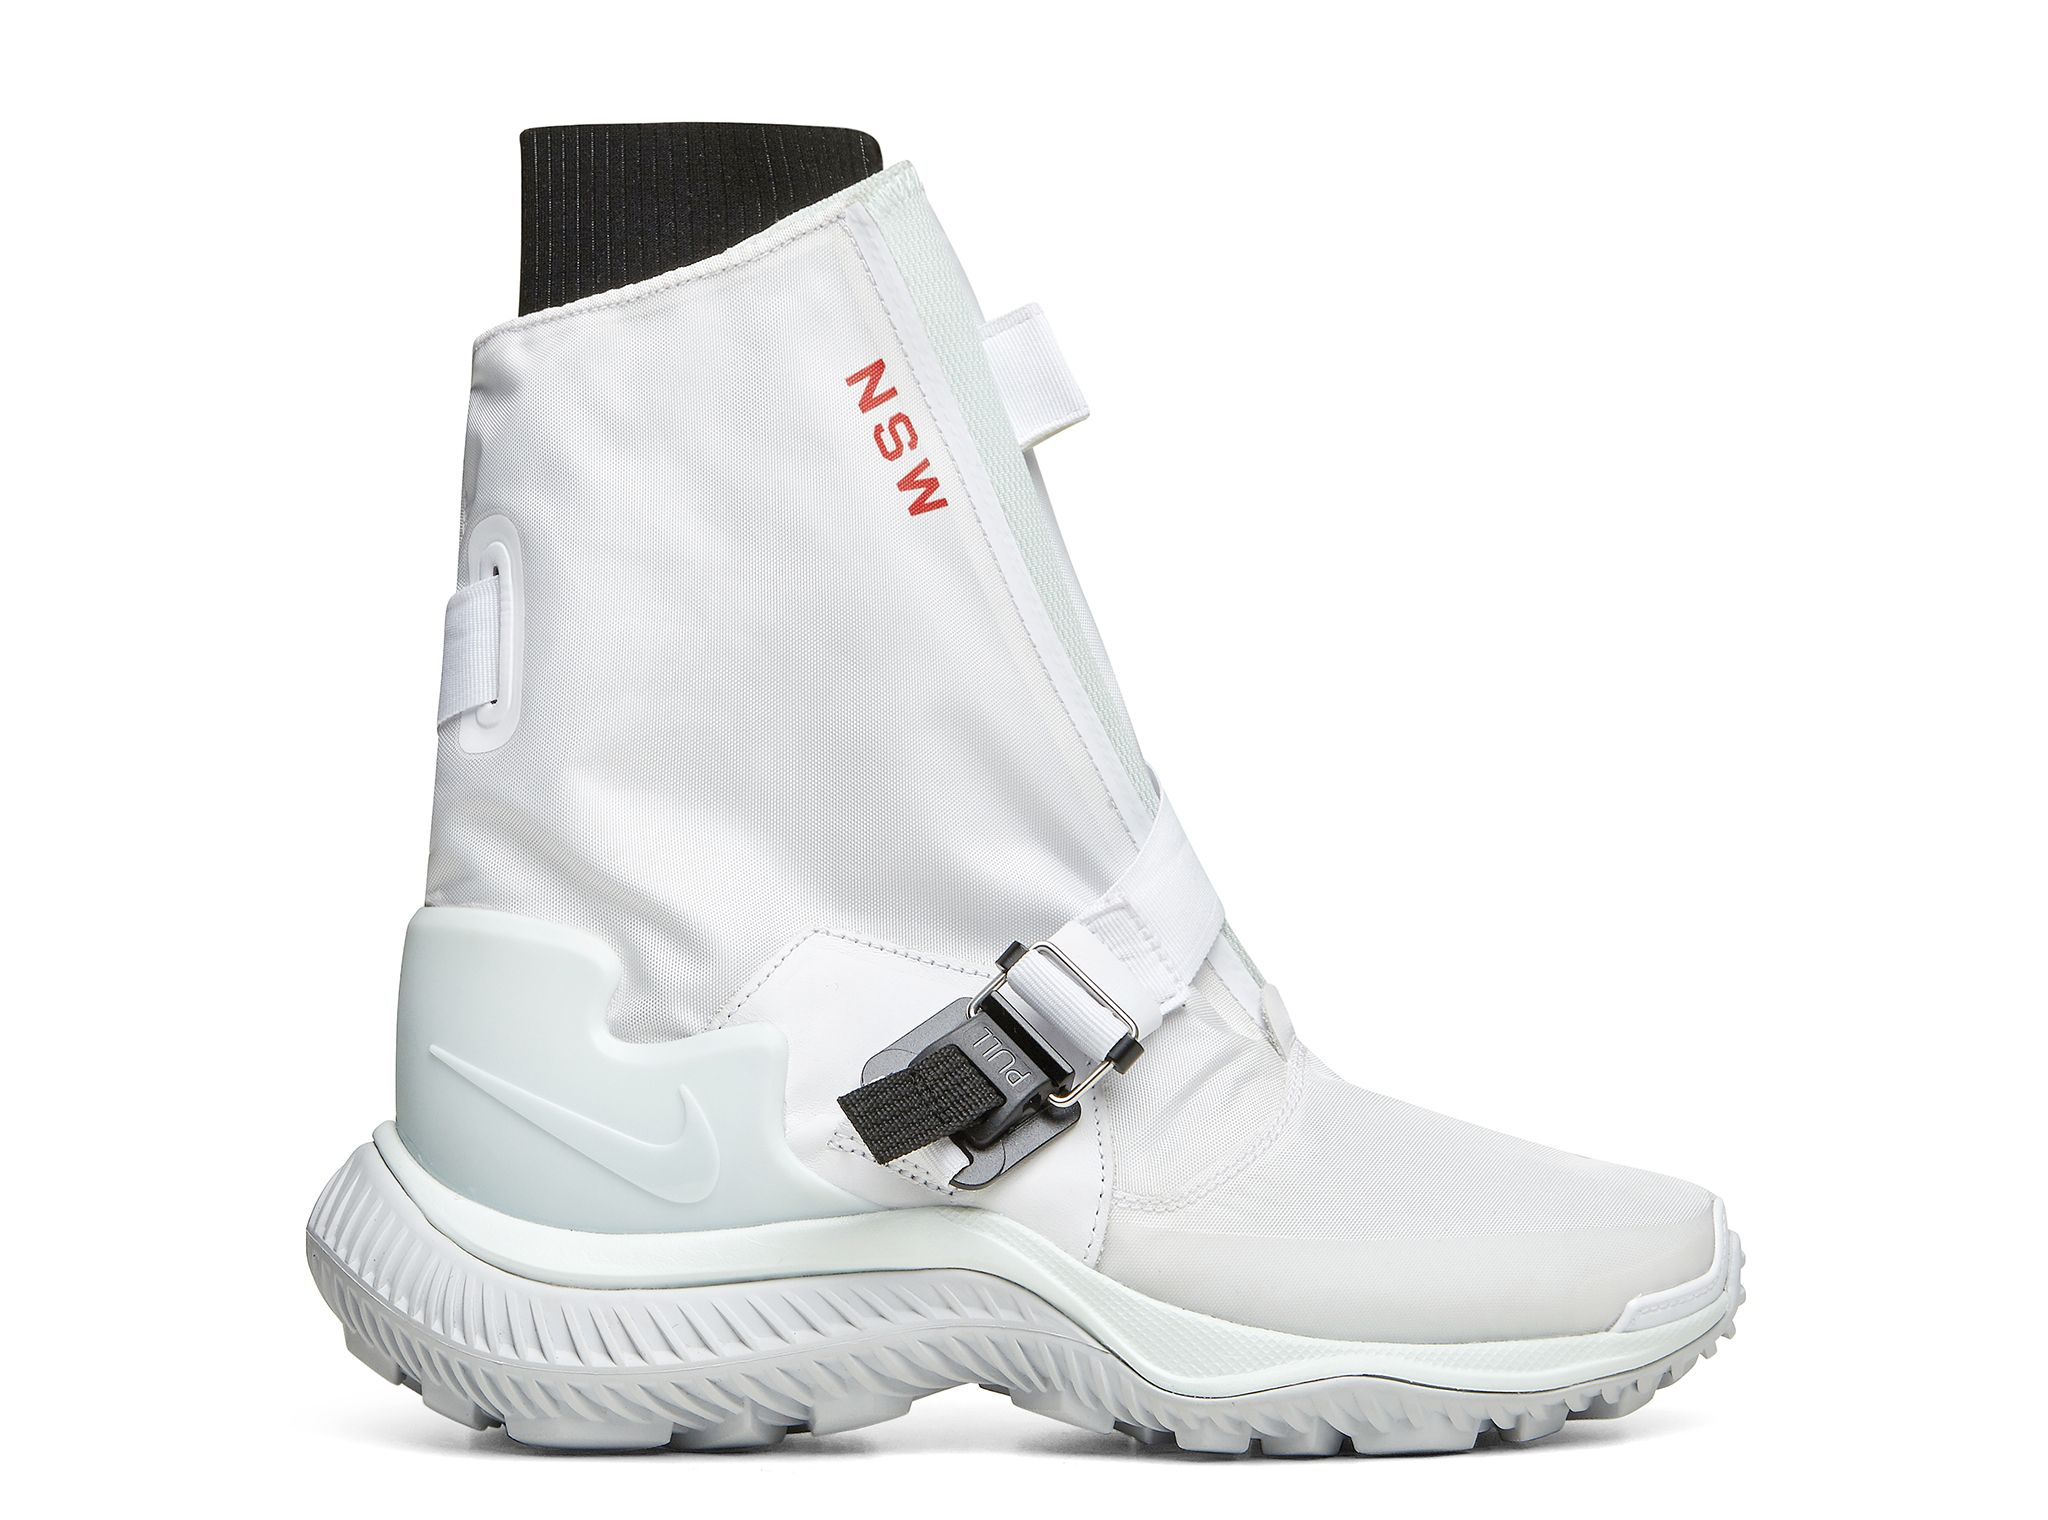 the latest f862b 8723c Nikelab x Gyakusou Wmns Gaiter Boot - Sneakerboy